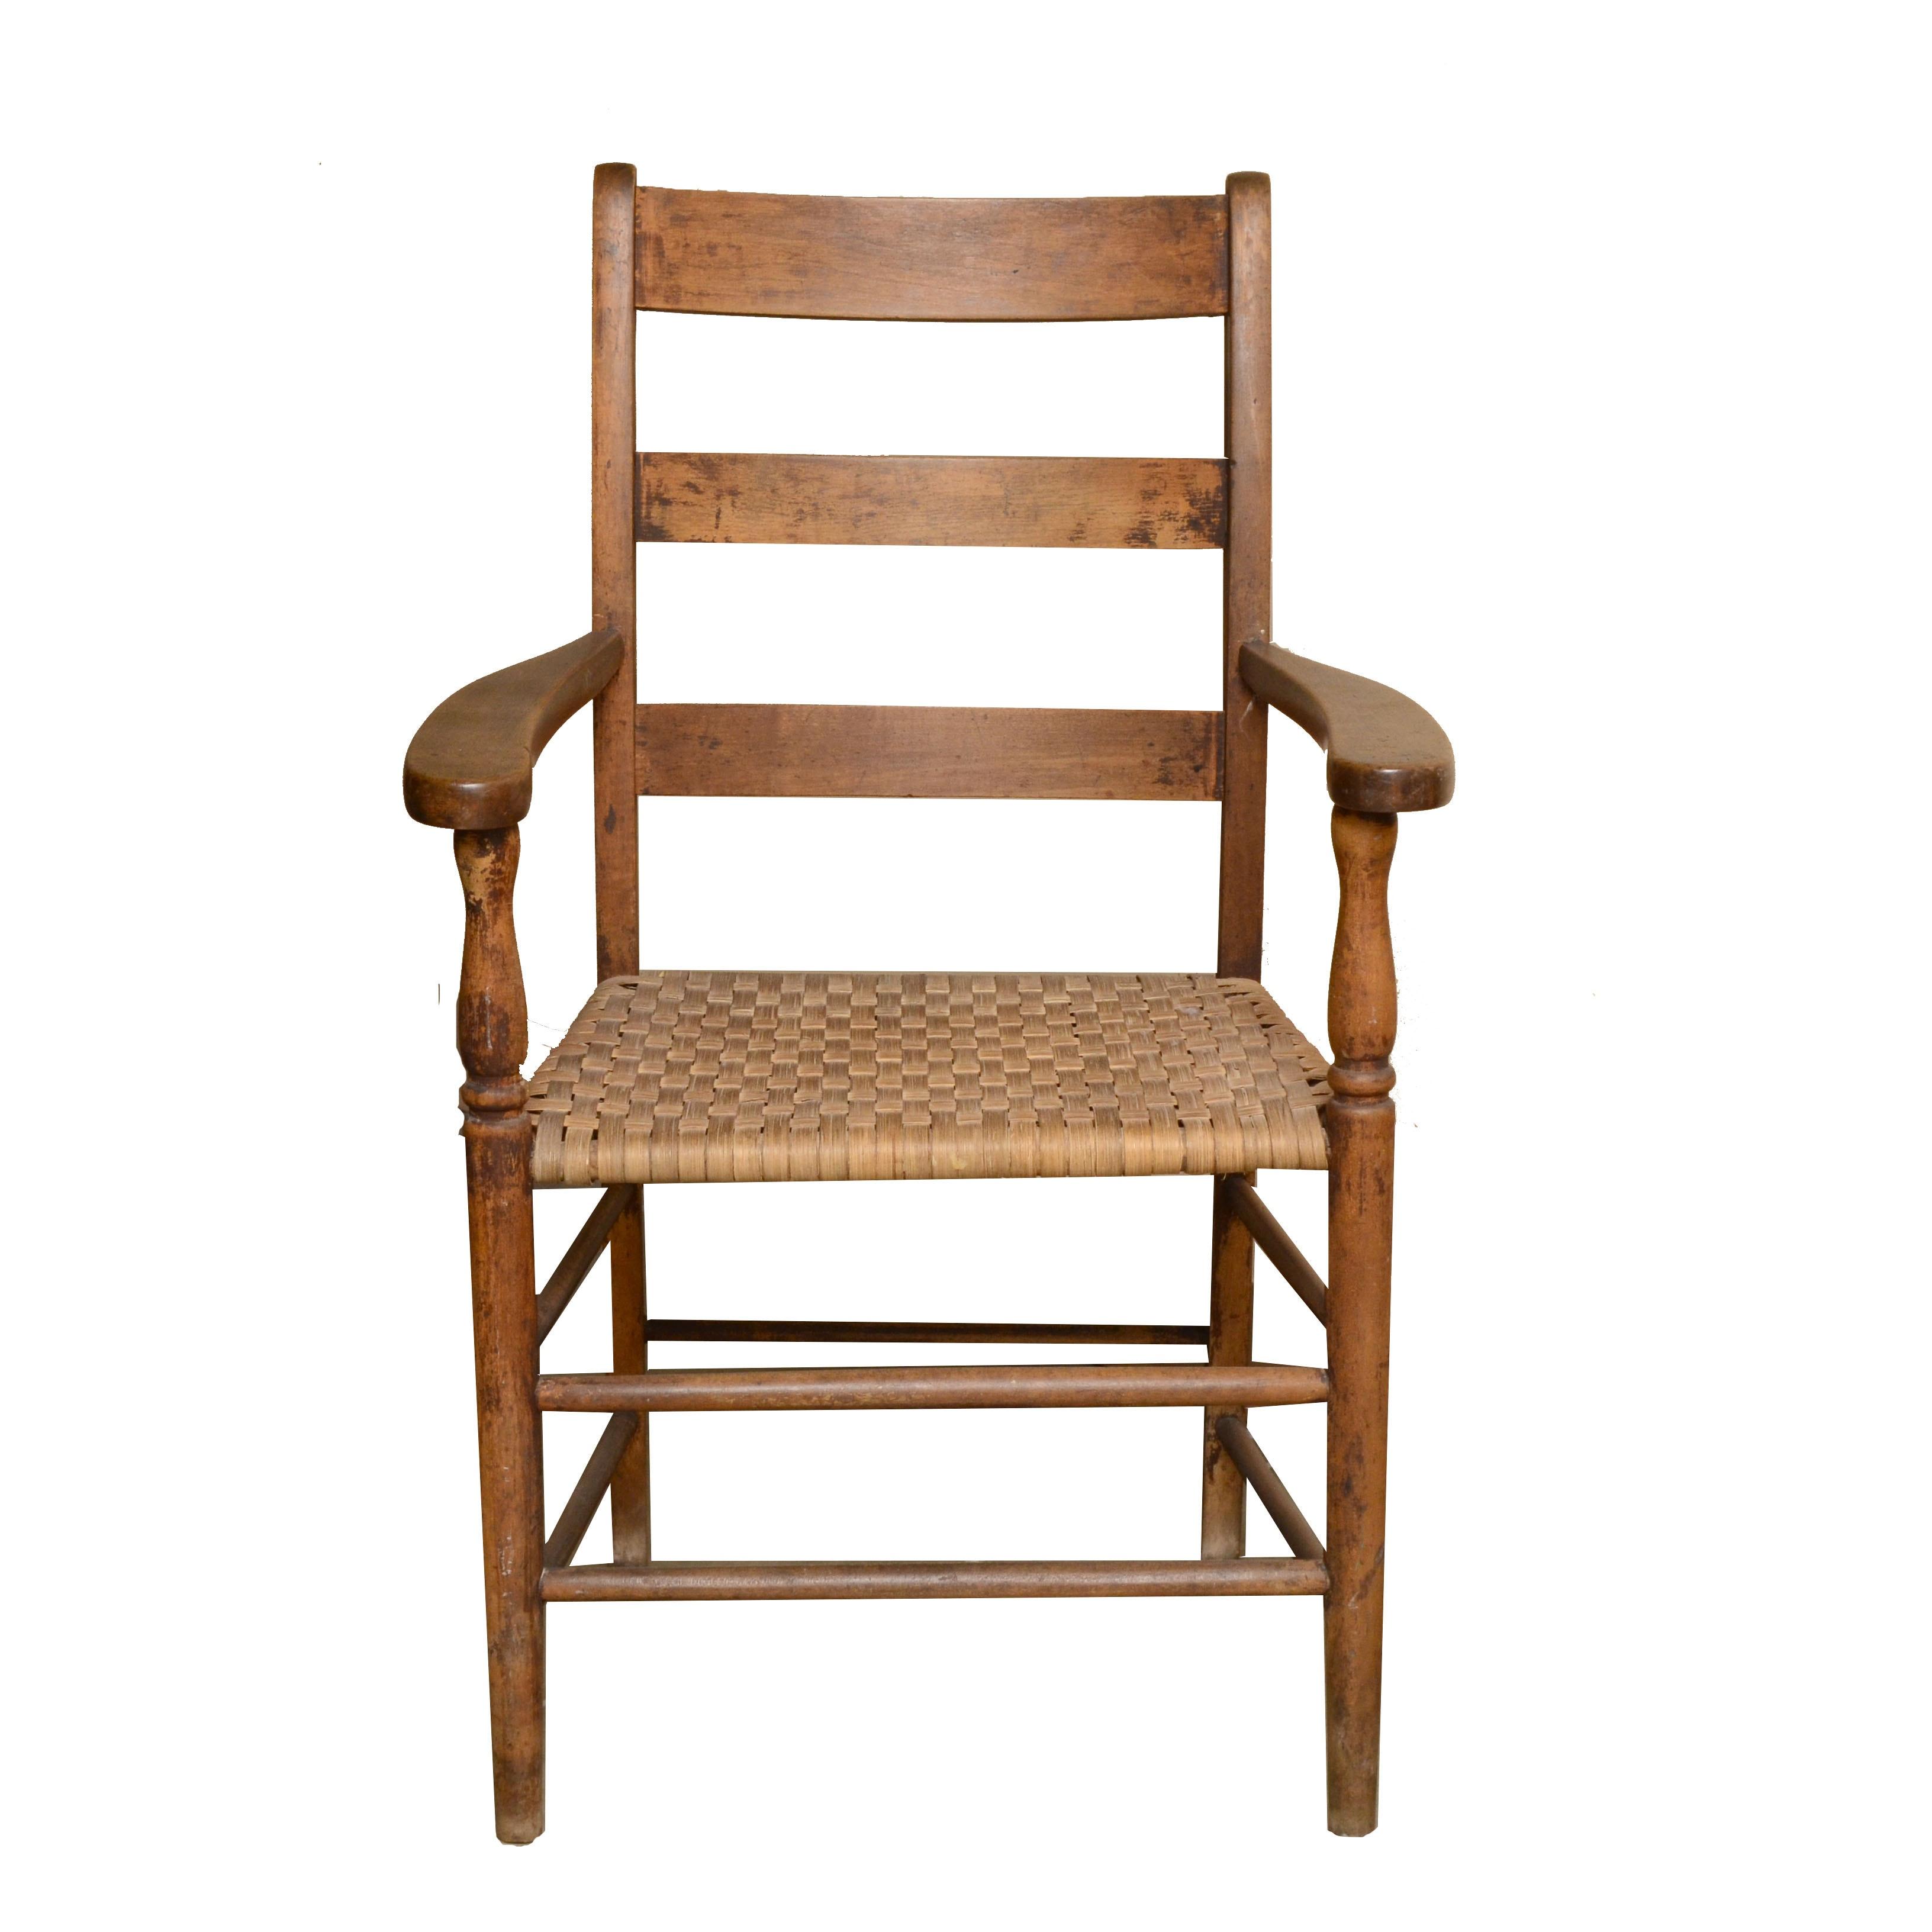 Antique Shaker Ladderback Armchair with Woven Splint Seat